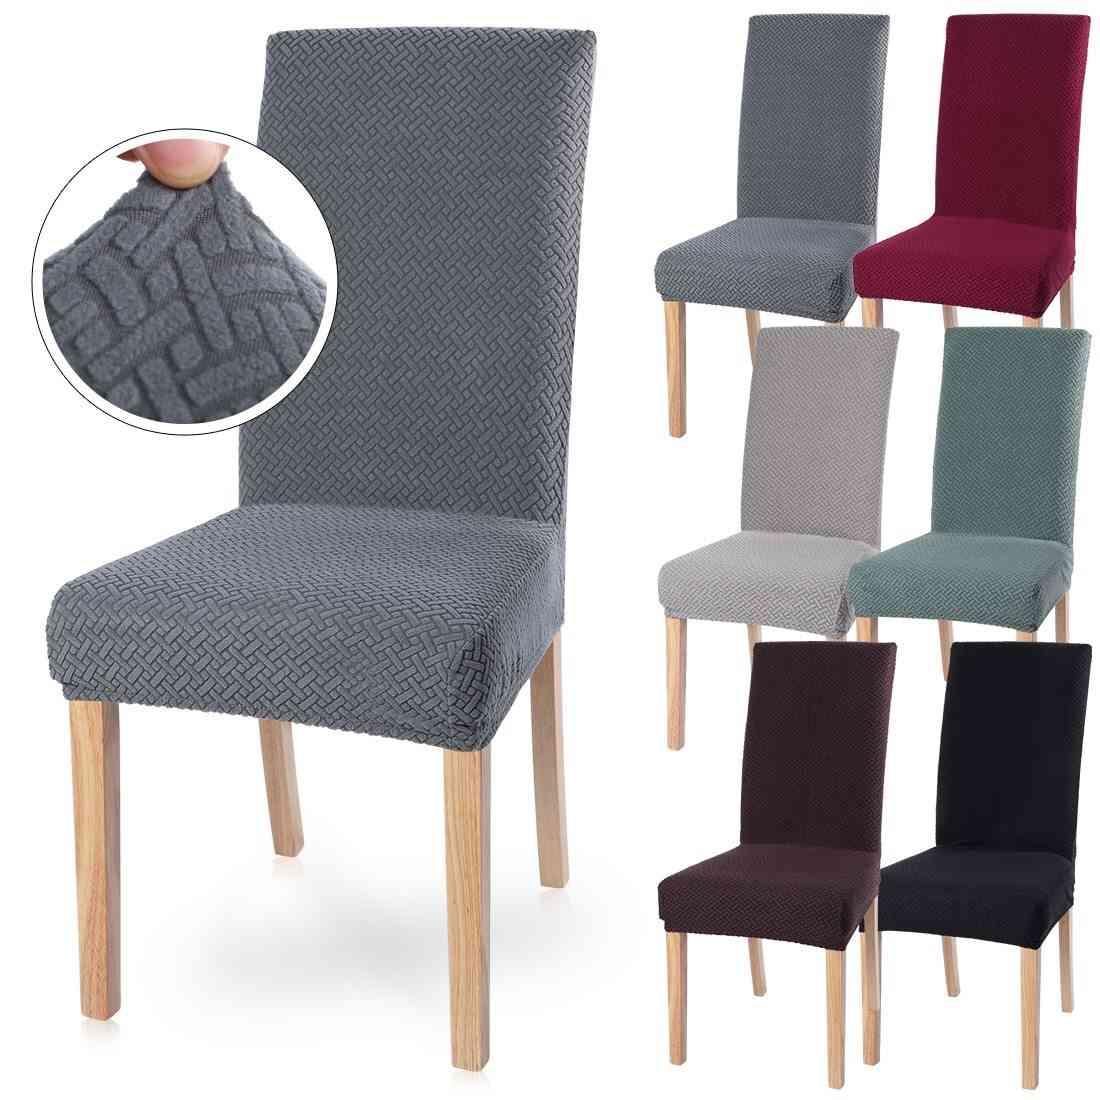 Chair Cover Spandex Stretch